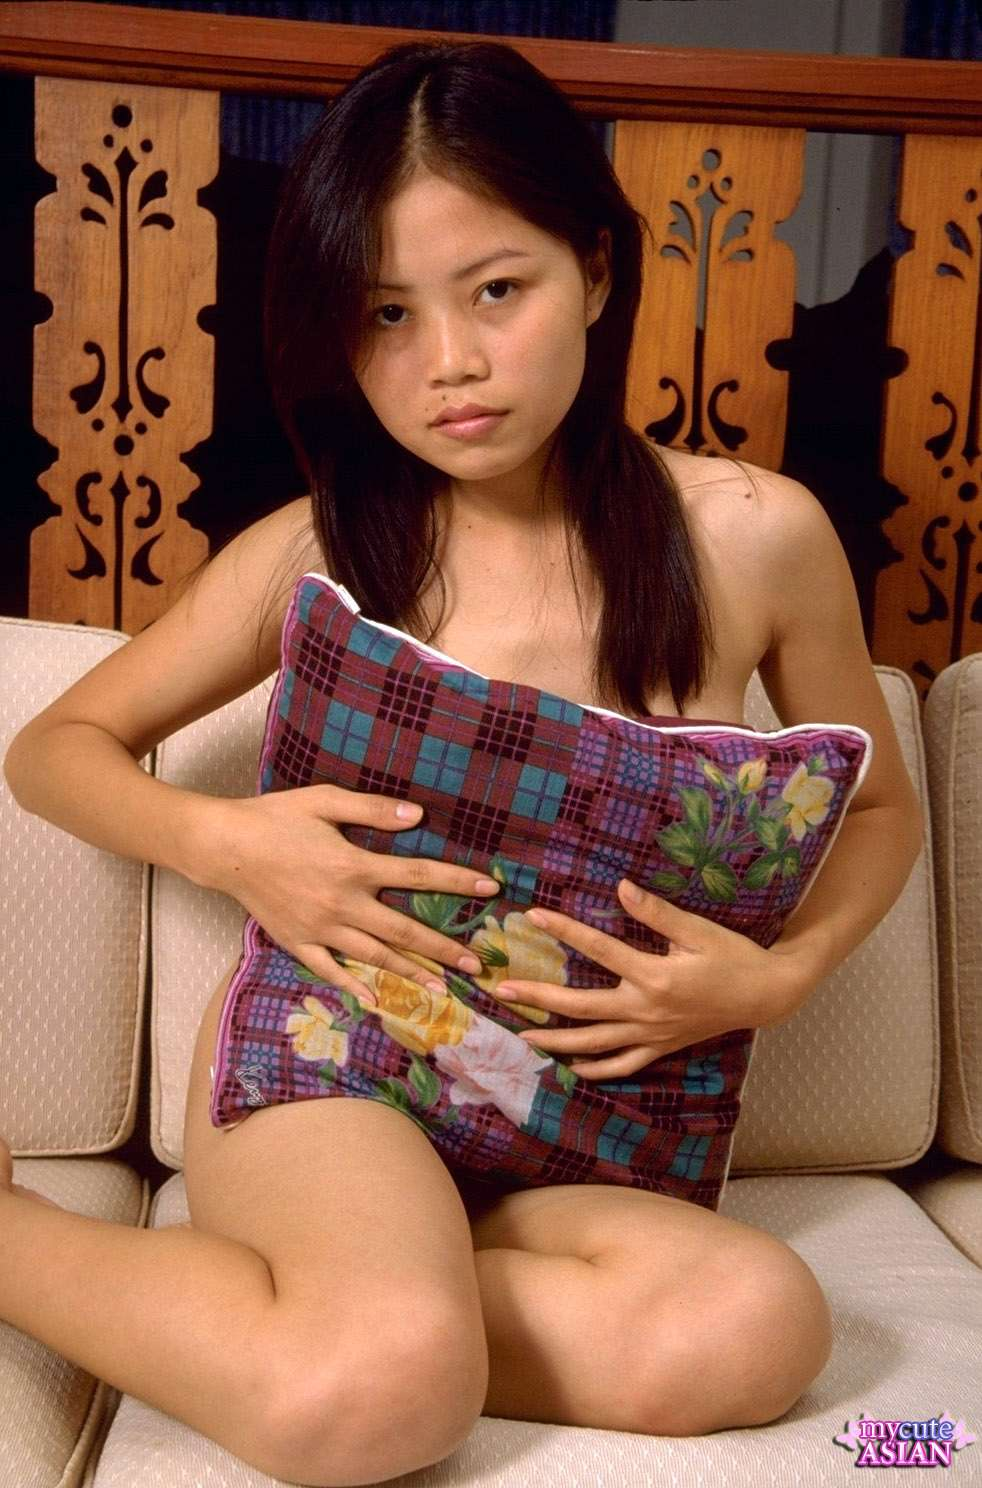 Asian Amateur Teen Strip Tease